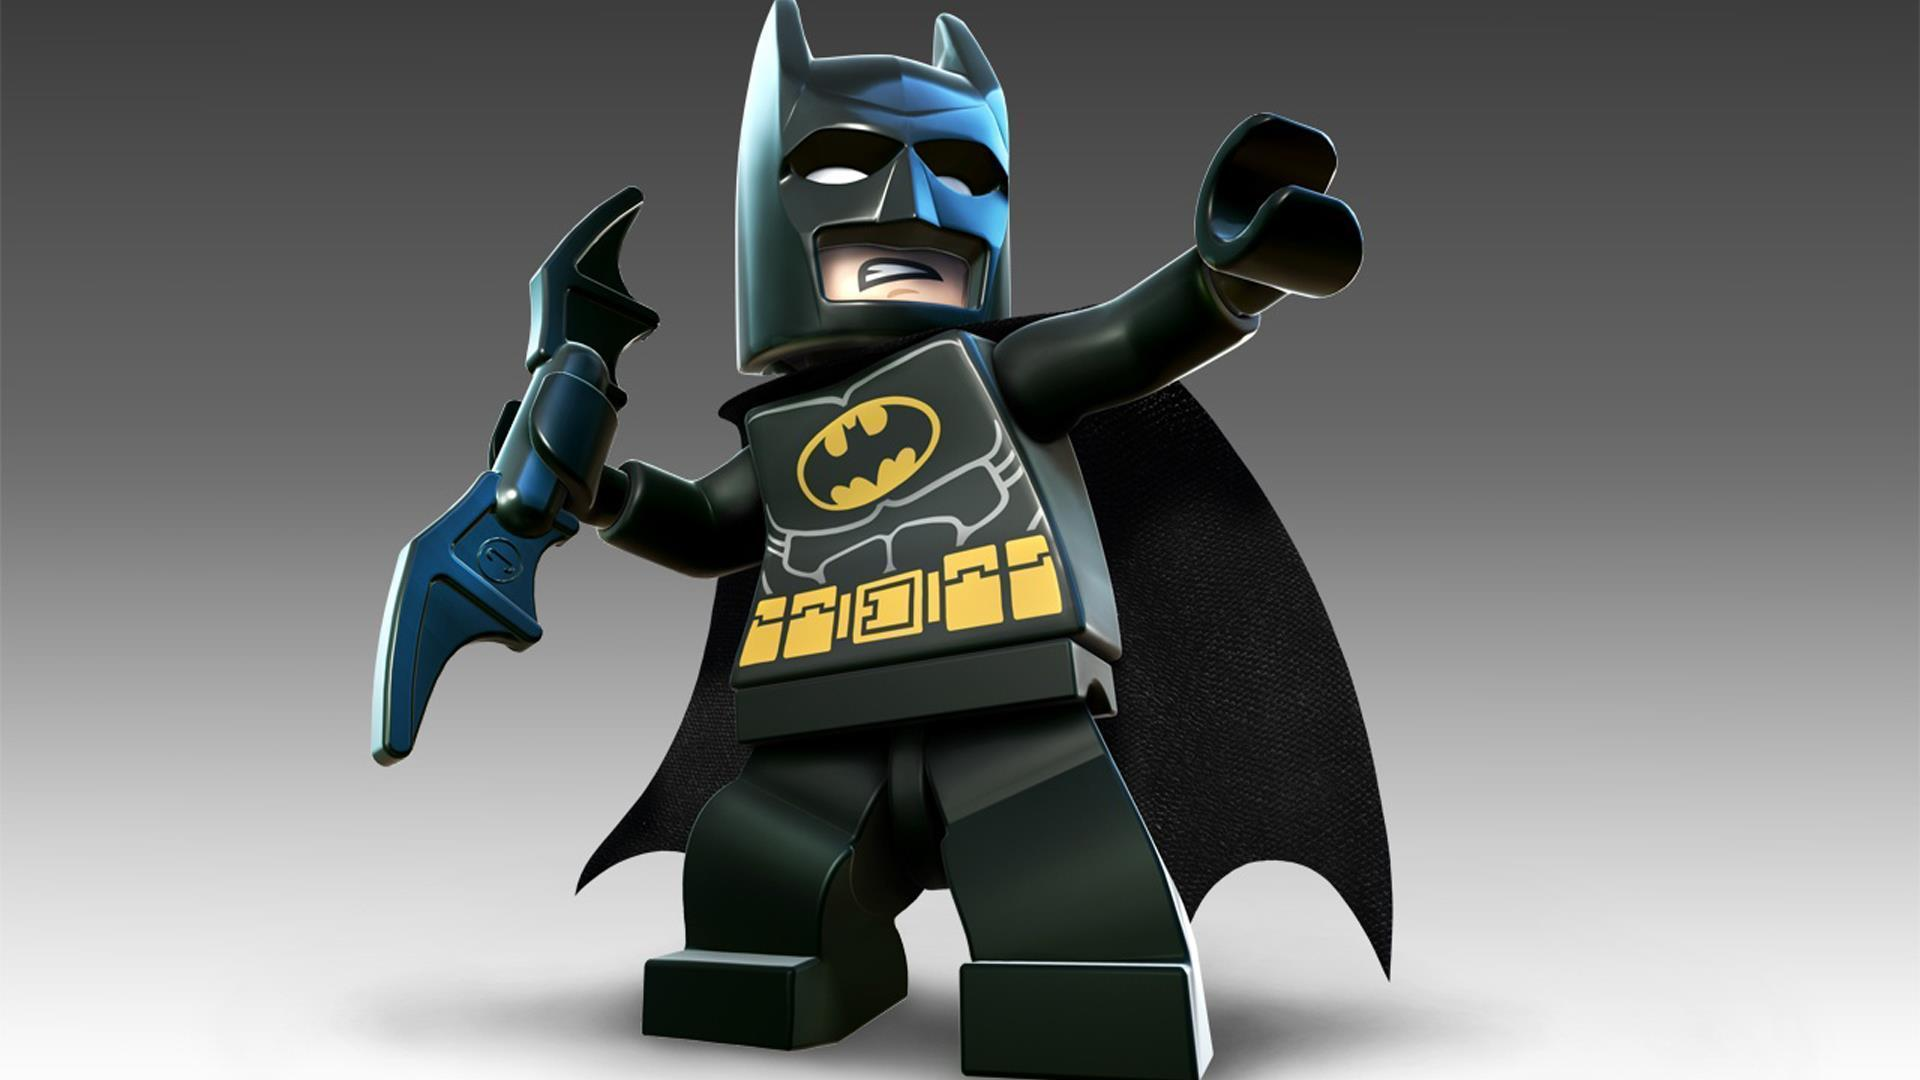 Lego Batman Wallpapers Top Free Lego Batman Backgrounds Wallpaperaccess